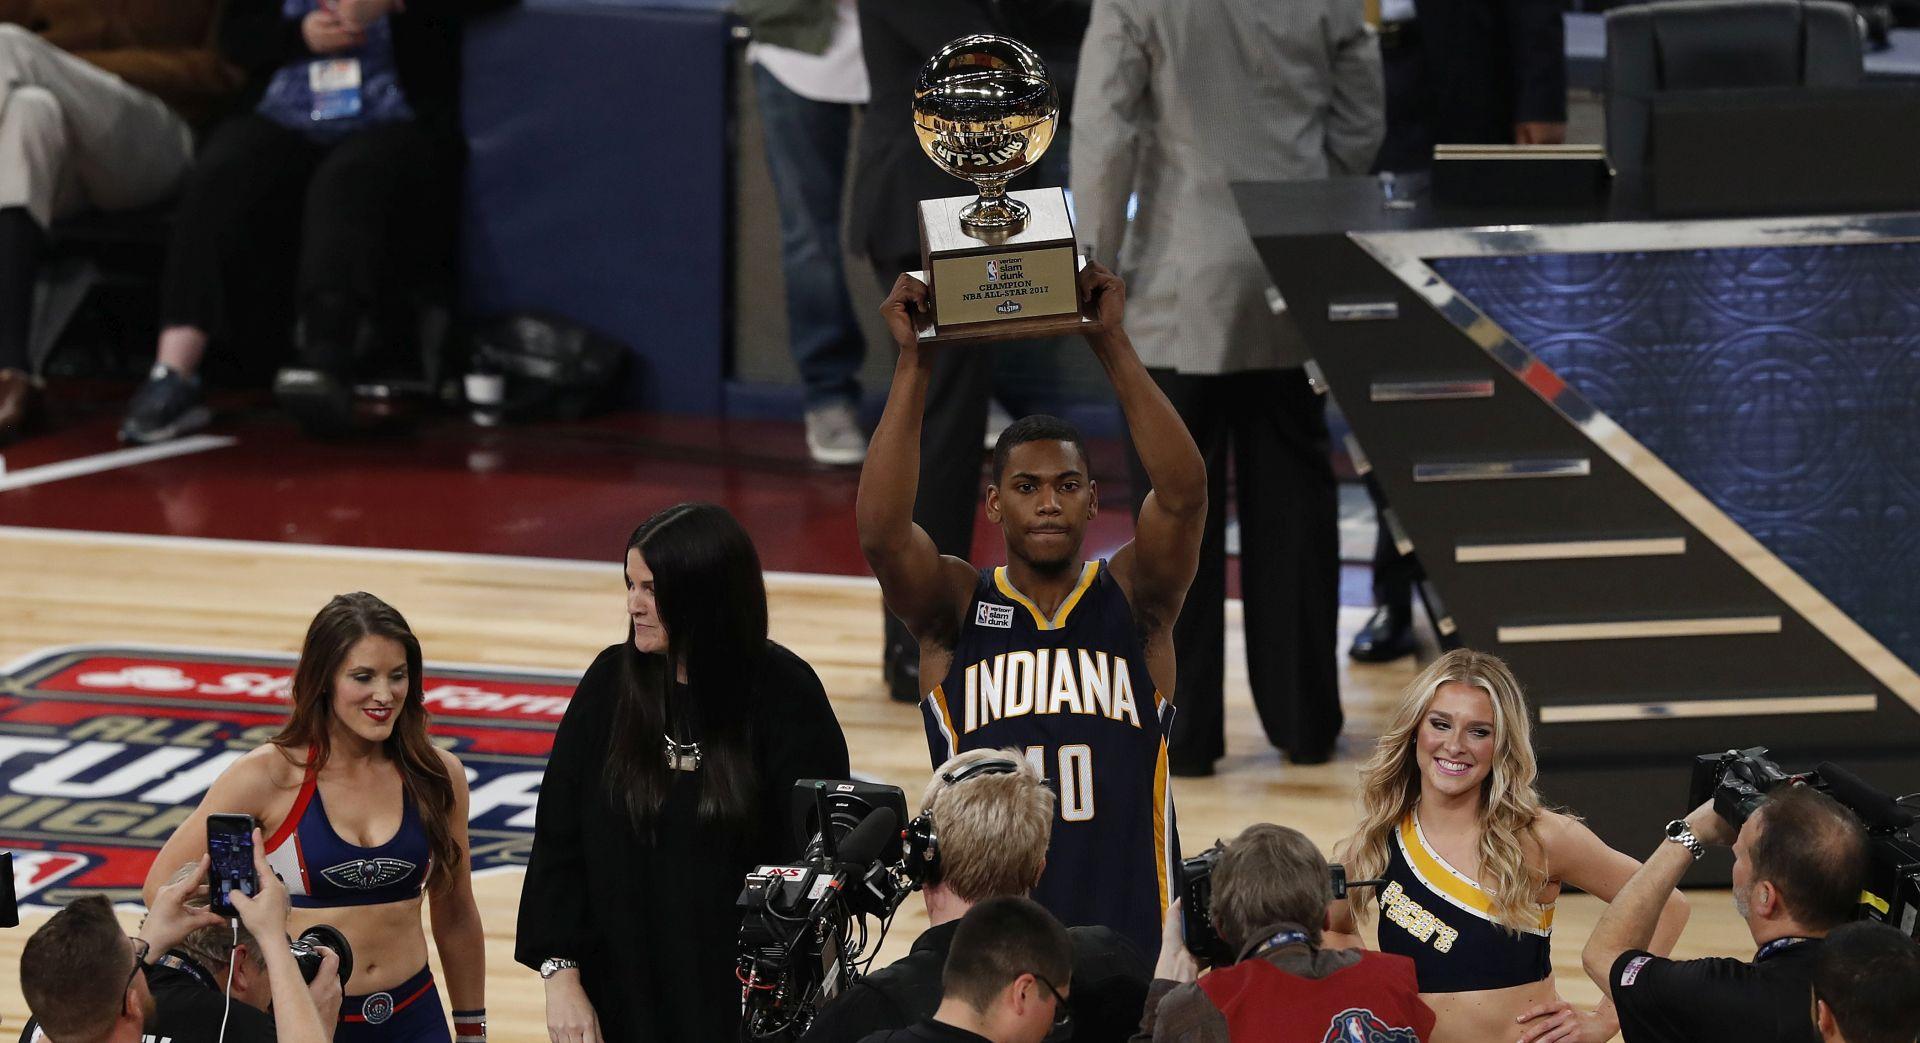 NBA ALL STAR Robinson III pobjednik u zakucavanju, Gordon u tricama